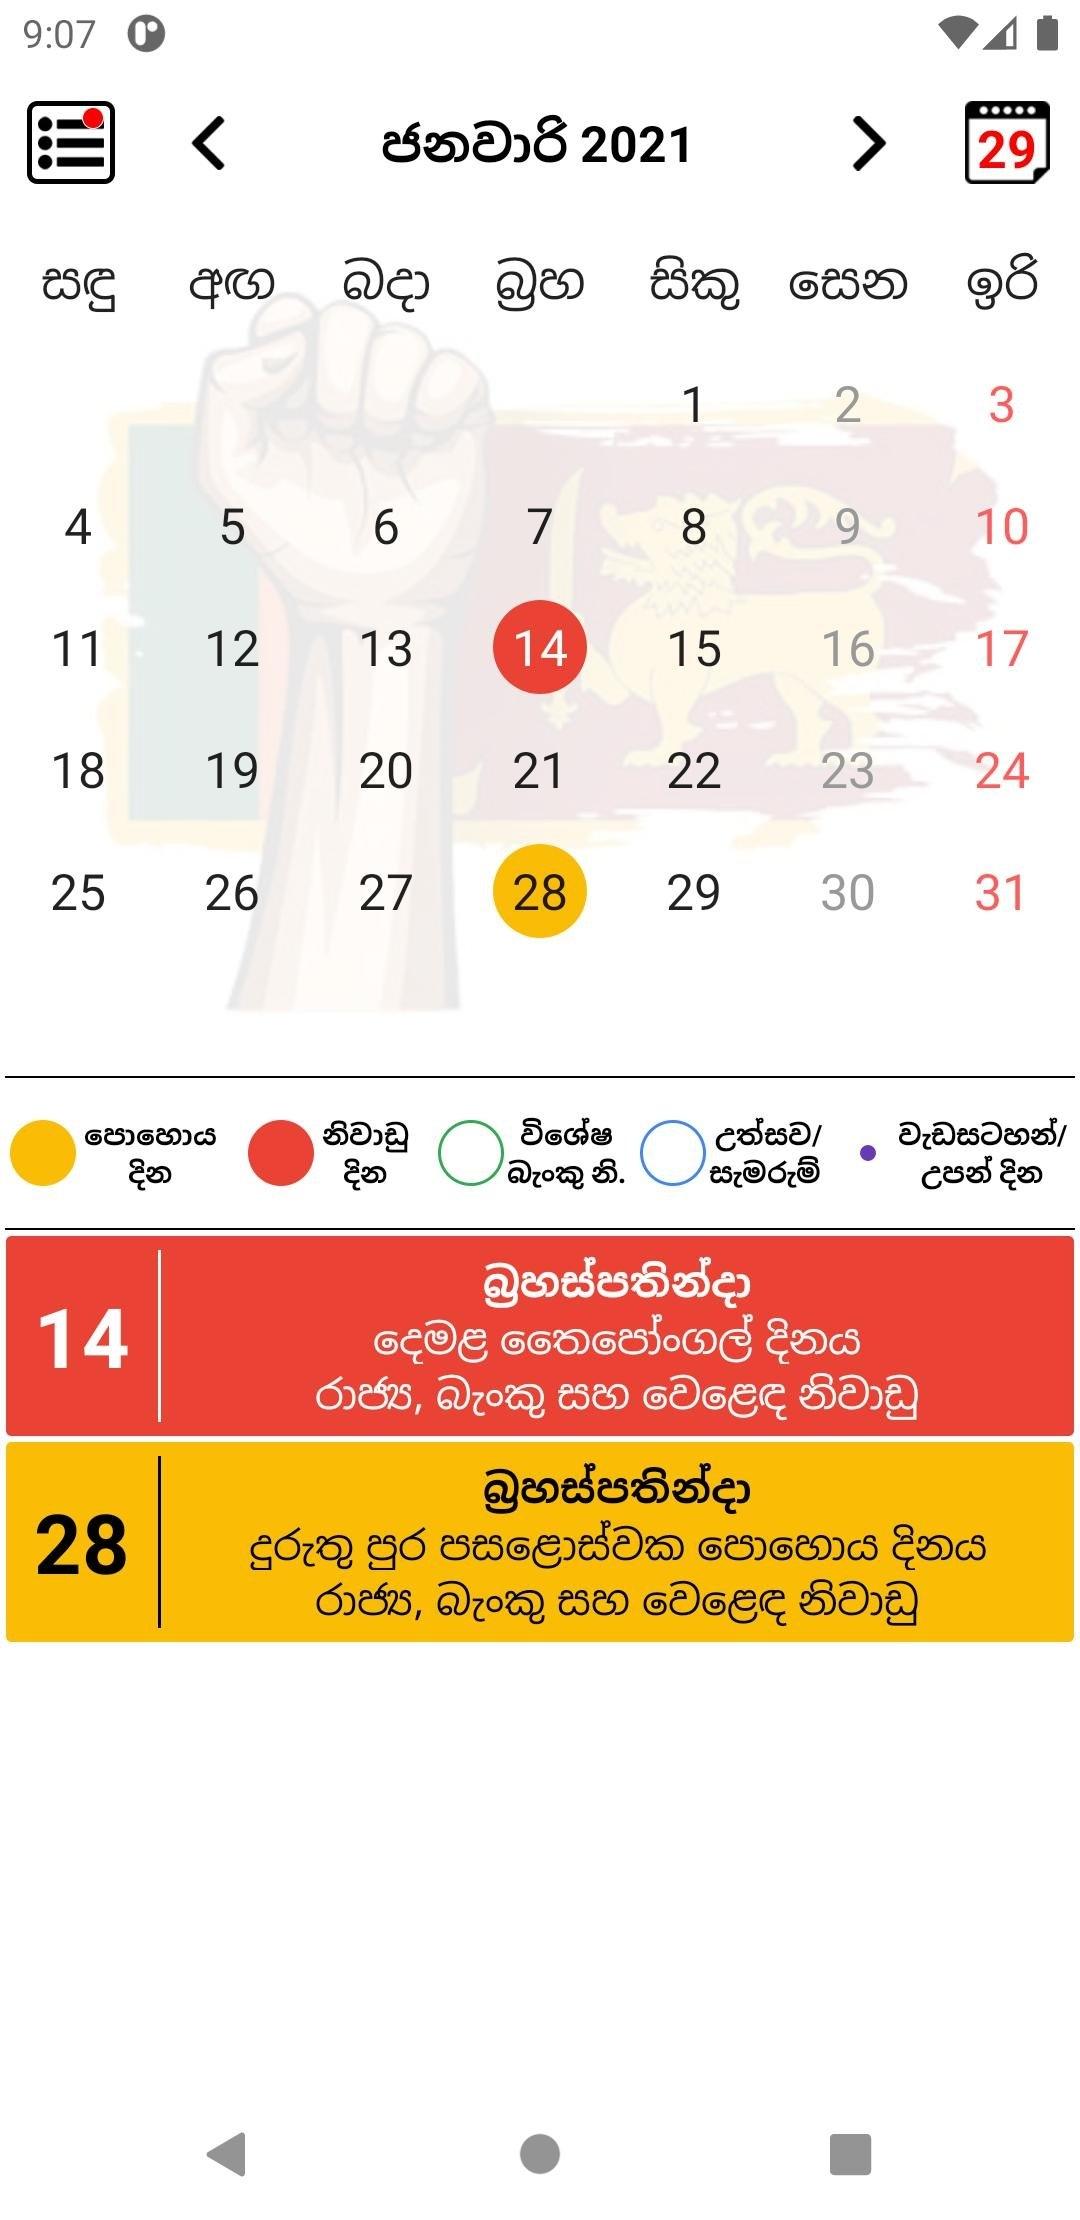 Sri Lanka Calendar 2021 🇱🇰 ¦ Sinhala ¦ Holidays For Android - Apk Download within Sri Lanka Calender 2021 Graphics